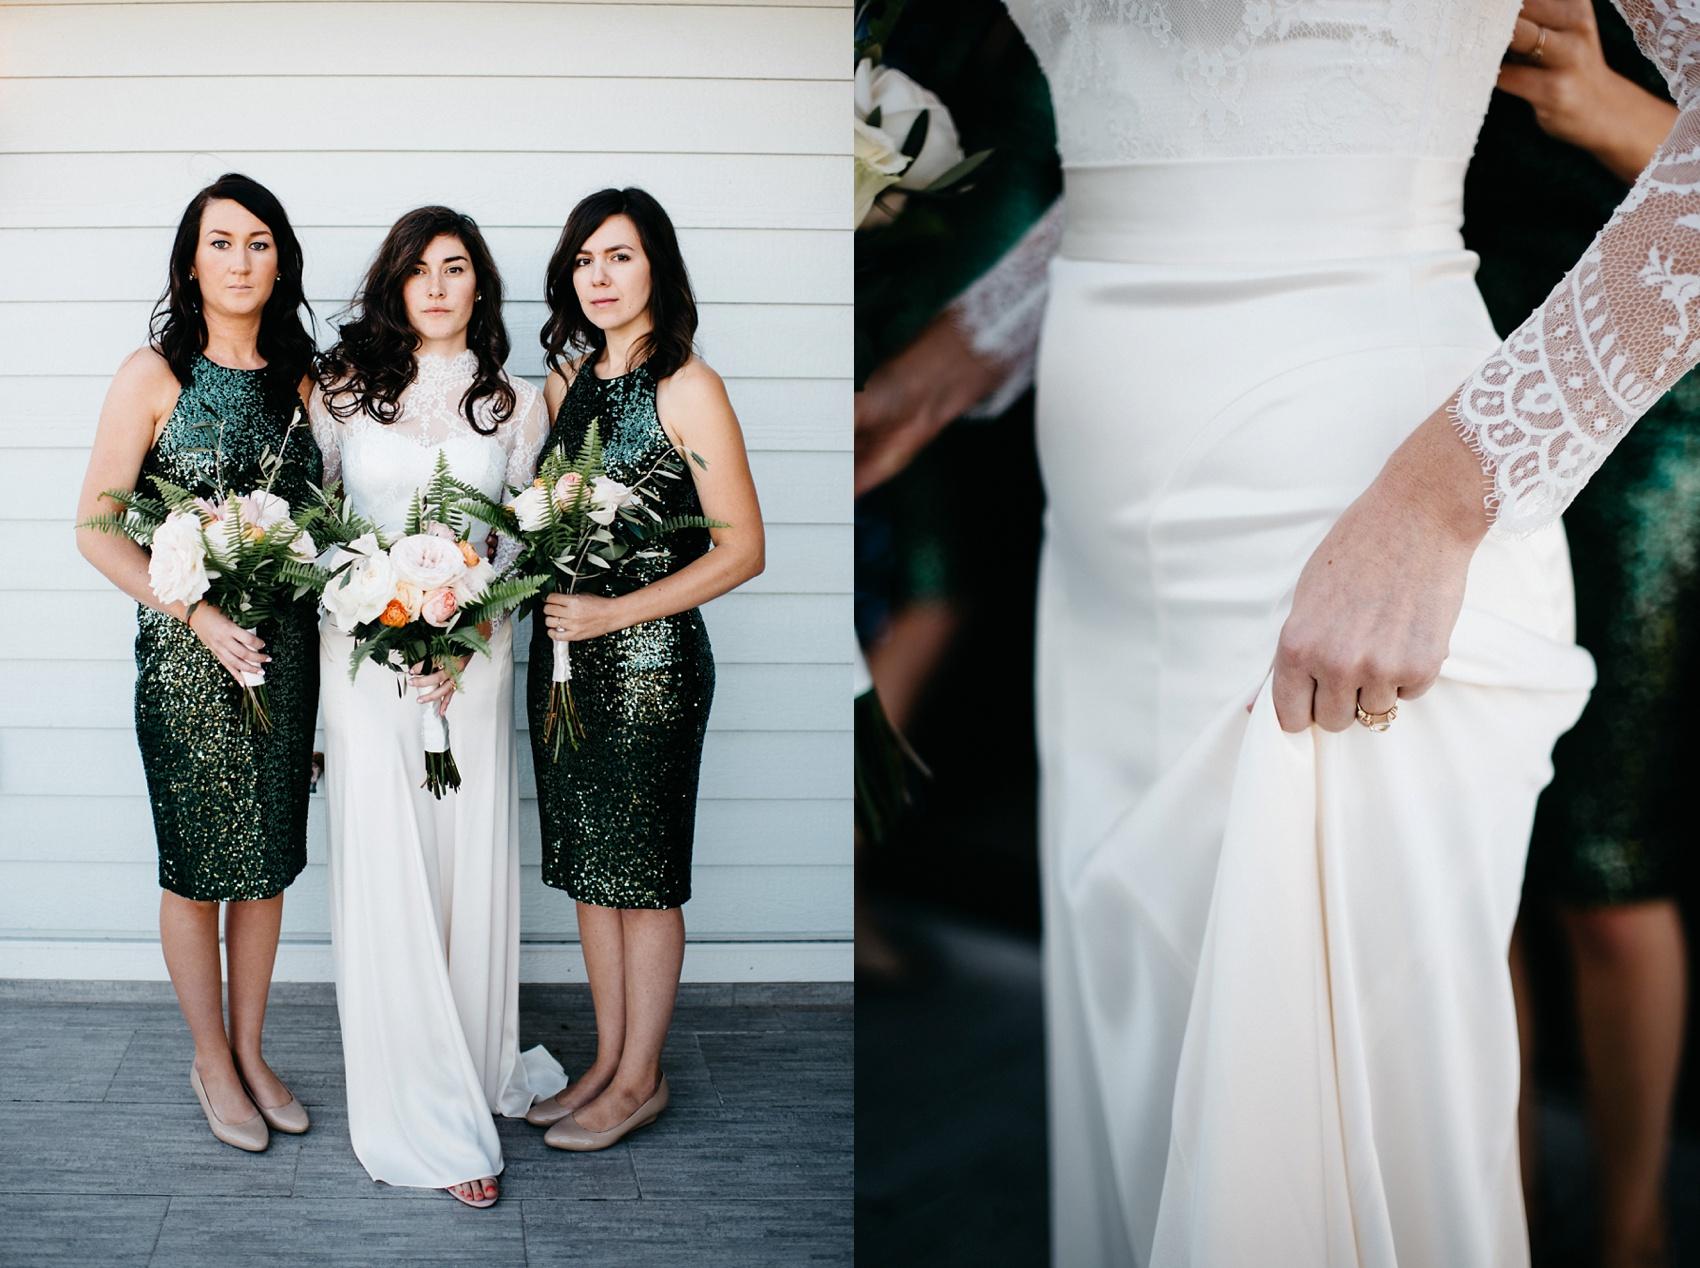 outerbanks_wedding_photographer_1260.jpg